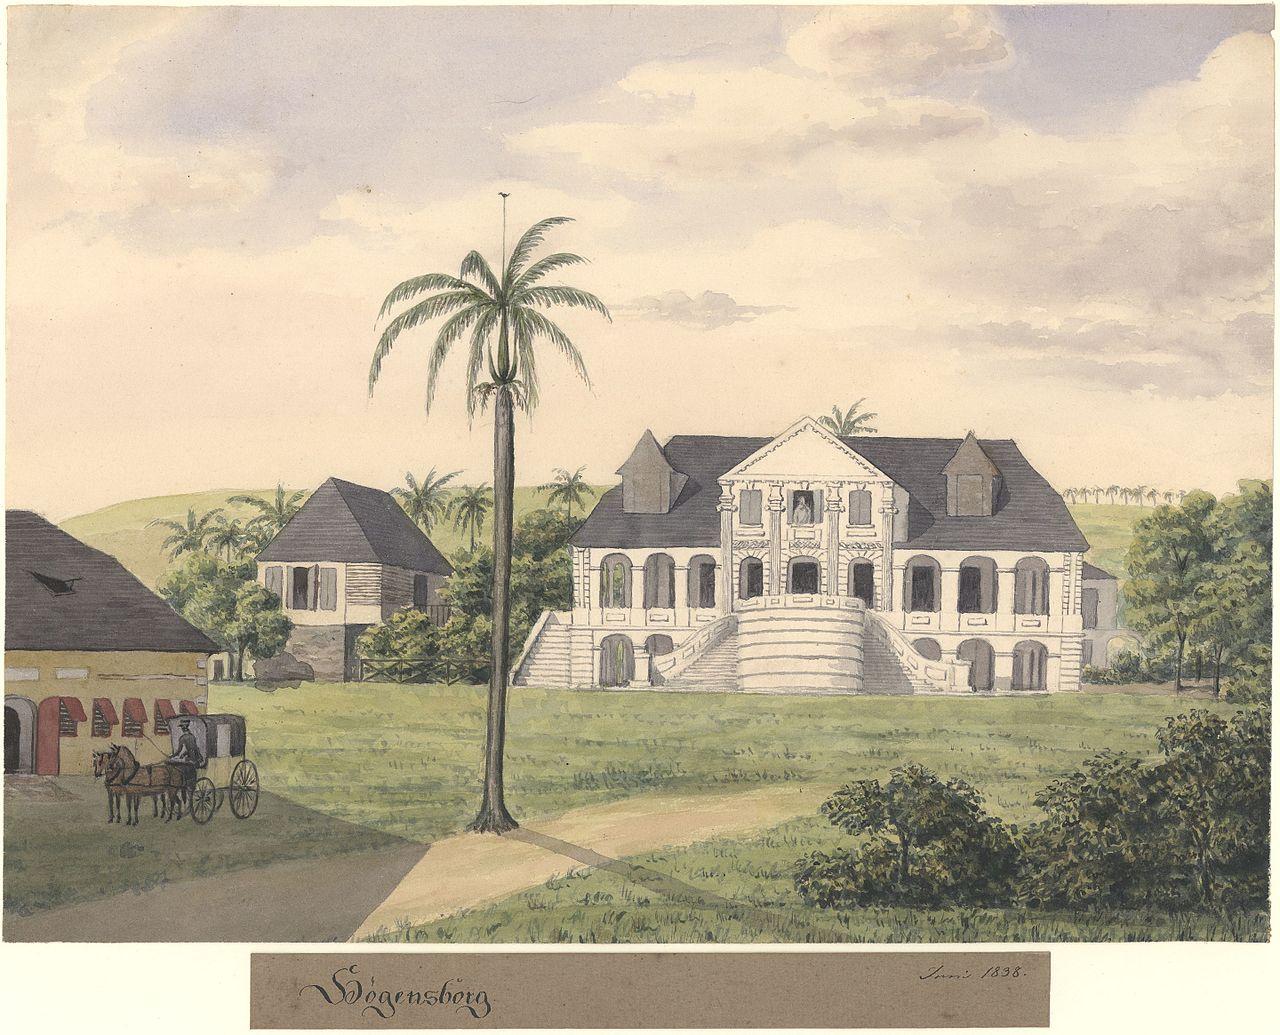 1280px-H%C3%B8gensborg%2C_Plantation%2C_St._Croix%2C_Danish_West_Indies.jpg